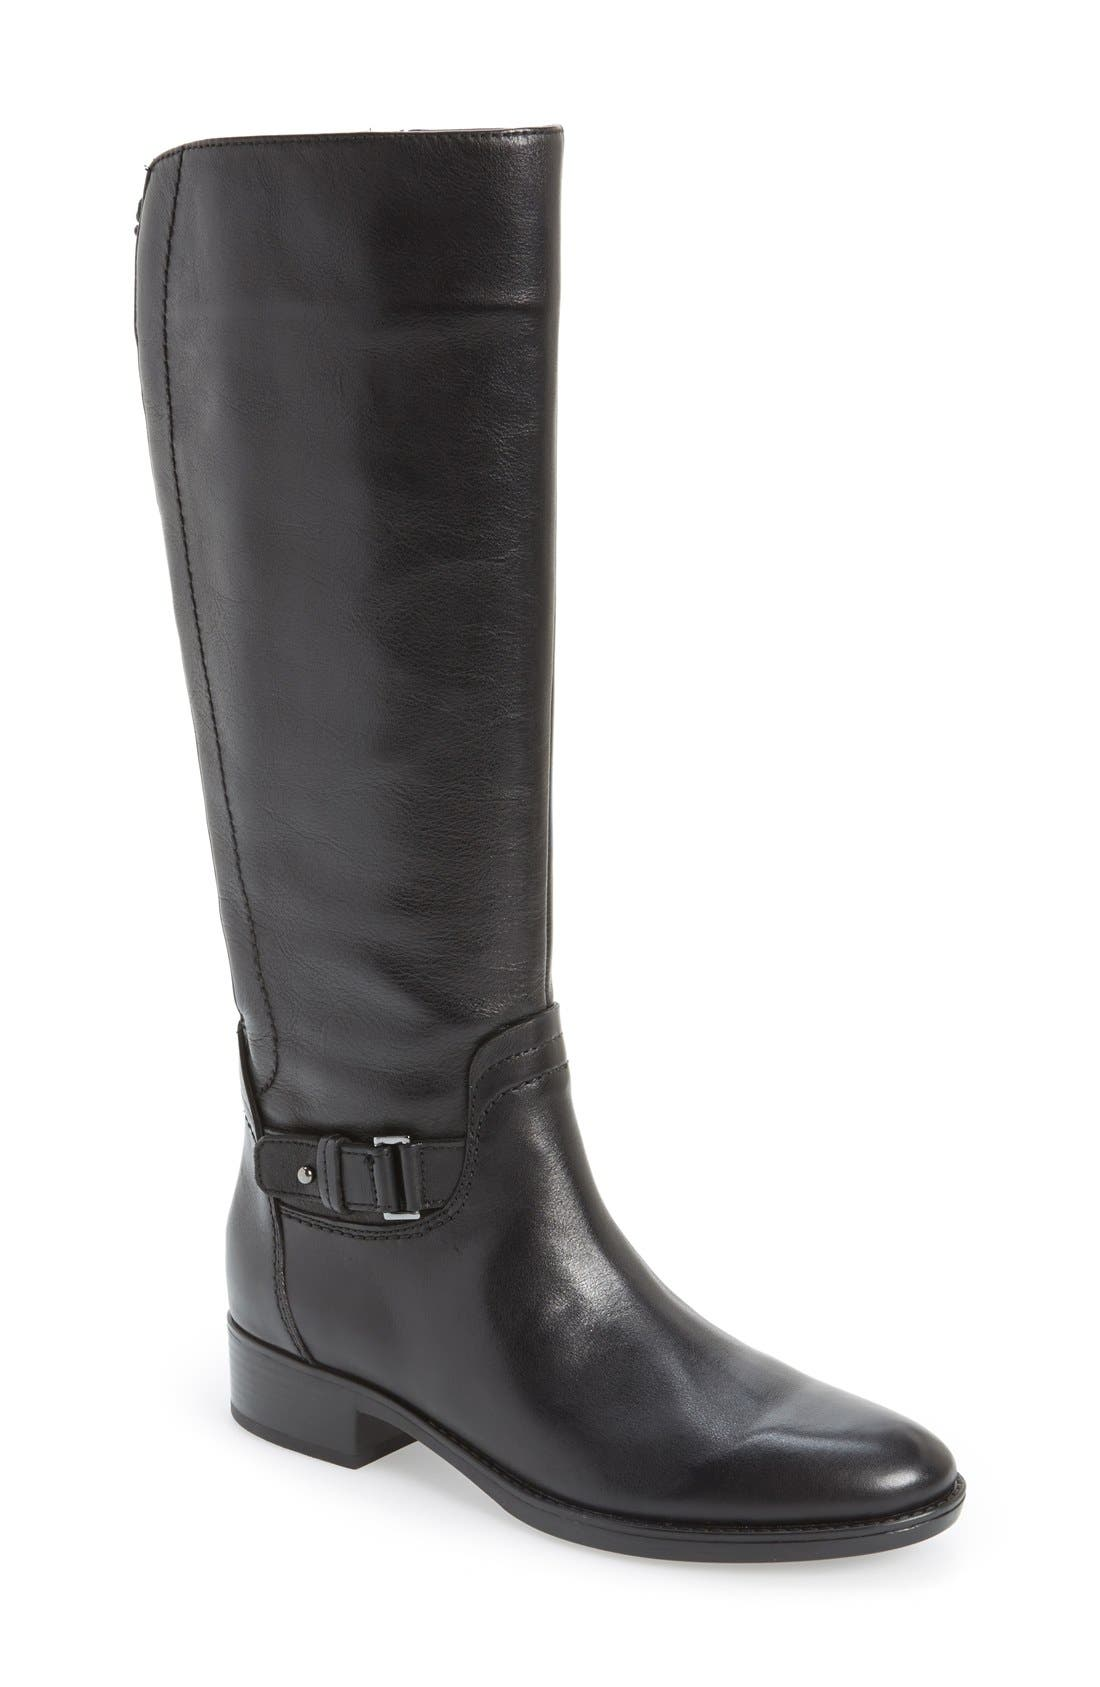 Main Image - Geox 'Felicity' Adjustable Shaft Tall Riding Boot (Women)